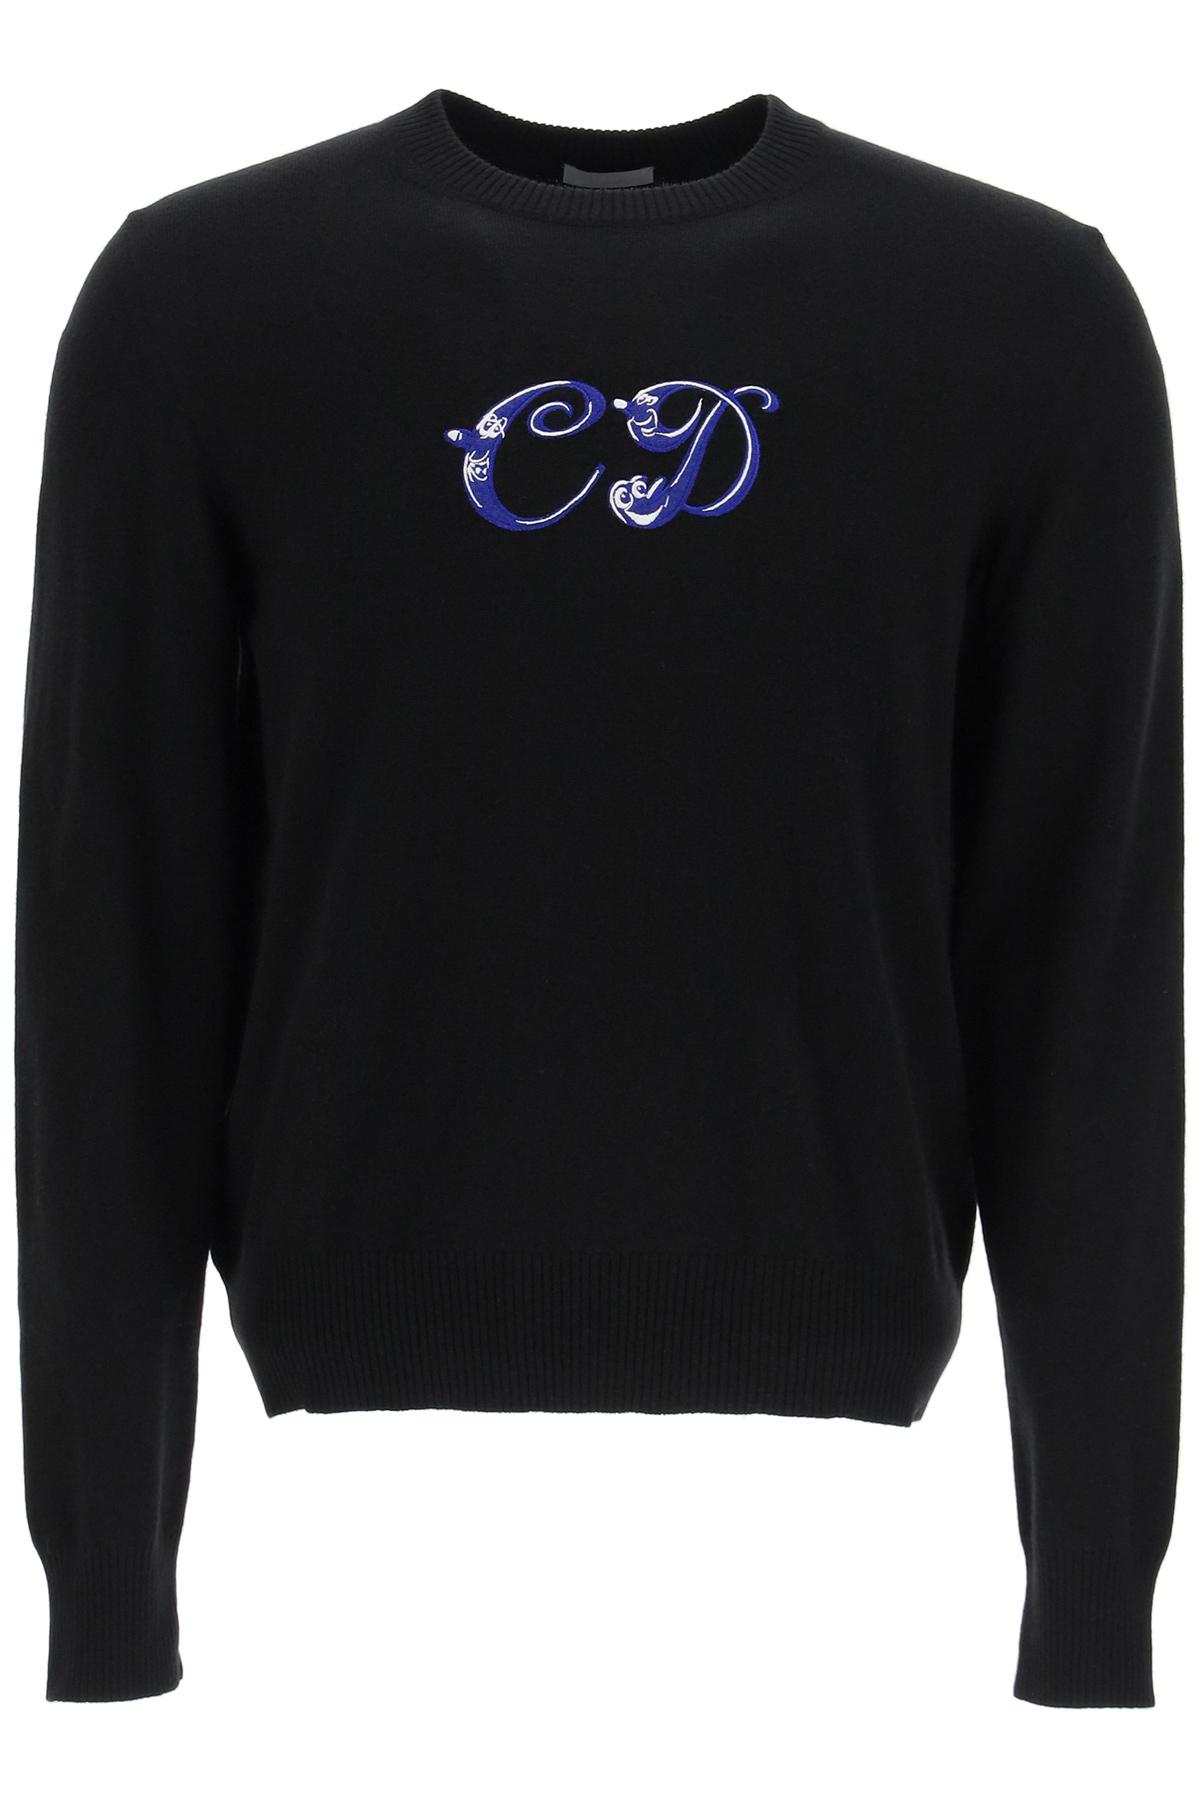 Dior maglione monogram cartoon